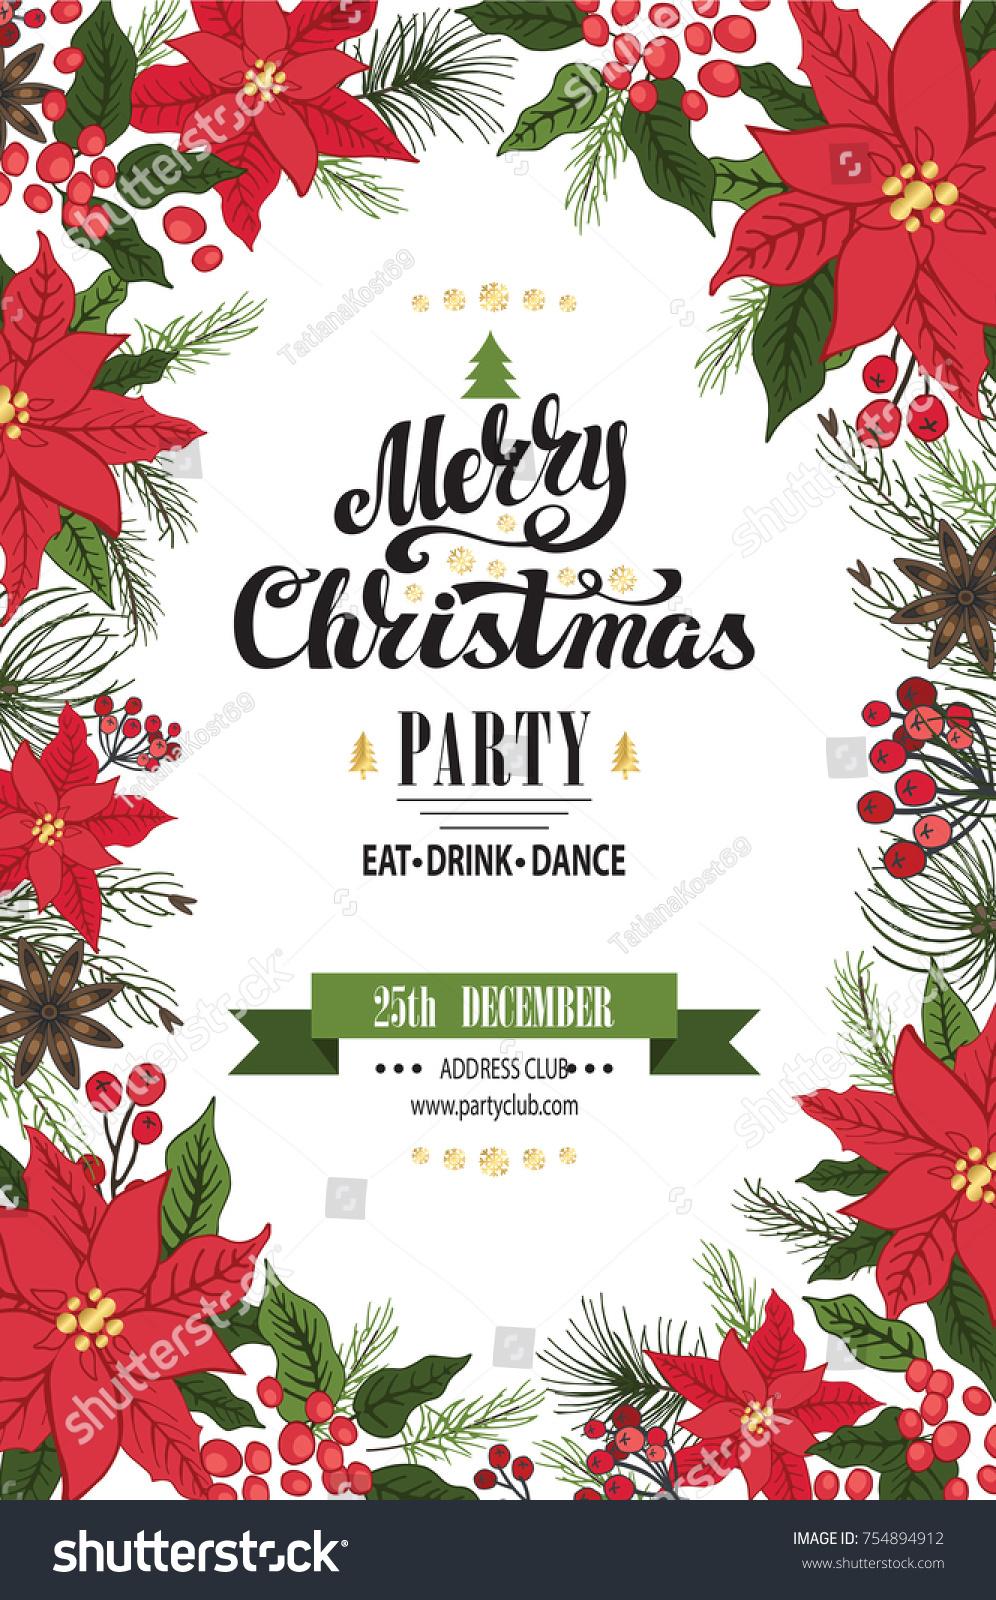 Christmas Party Invitationdesign Templateflyerticket Vector Merry ...